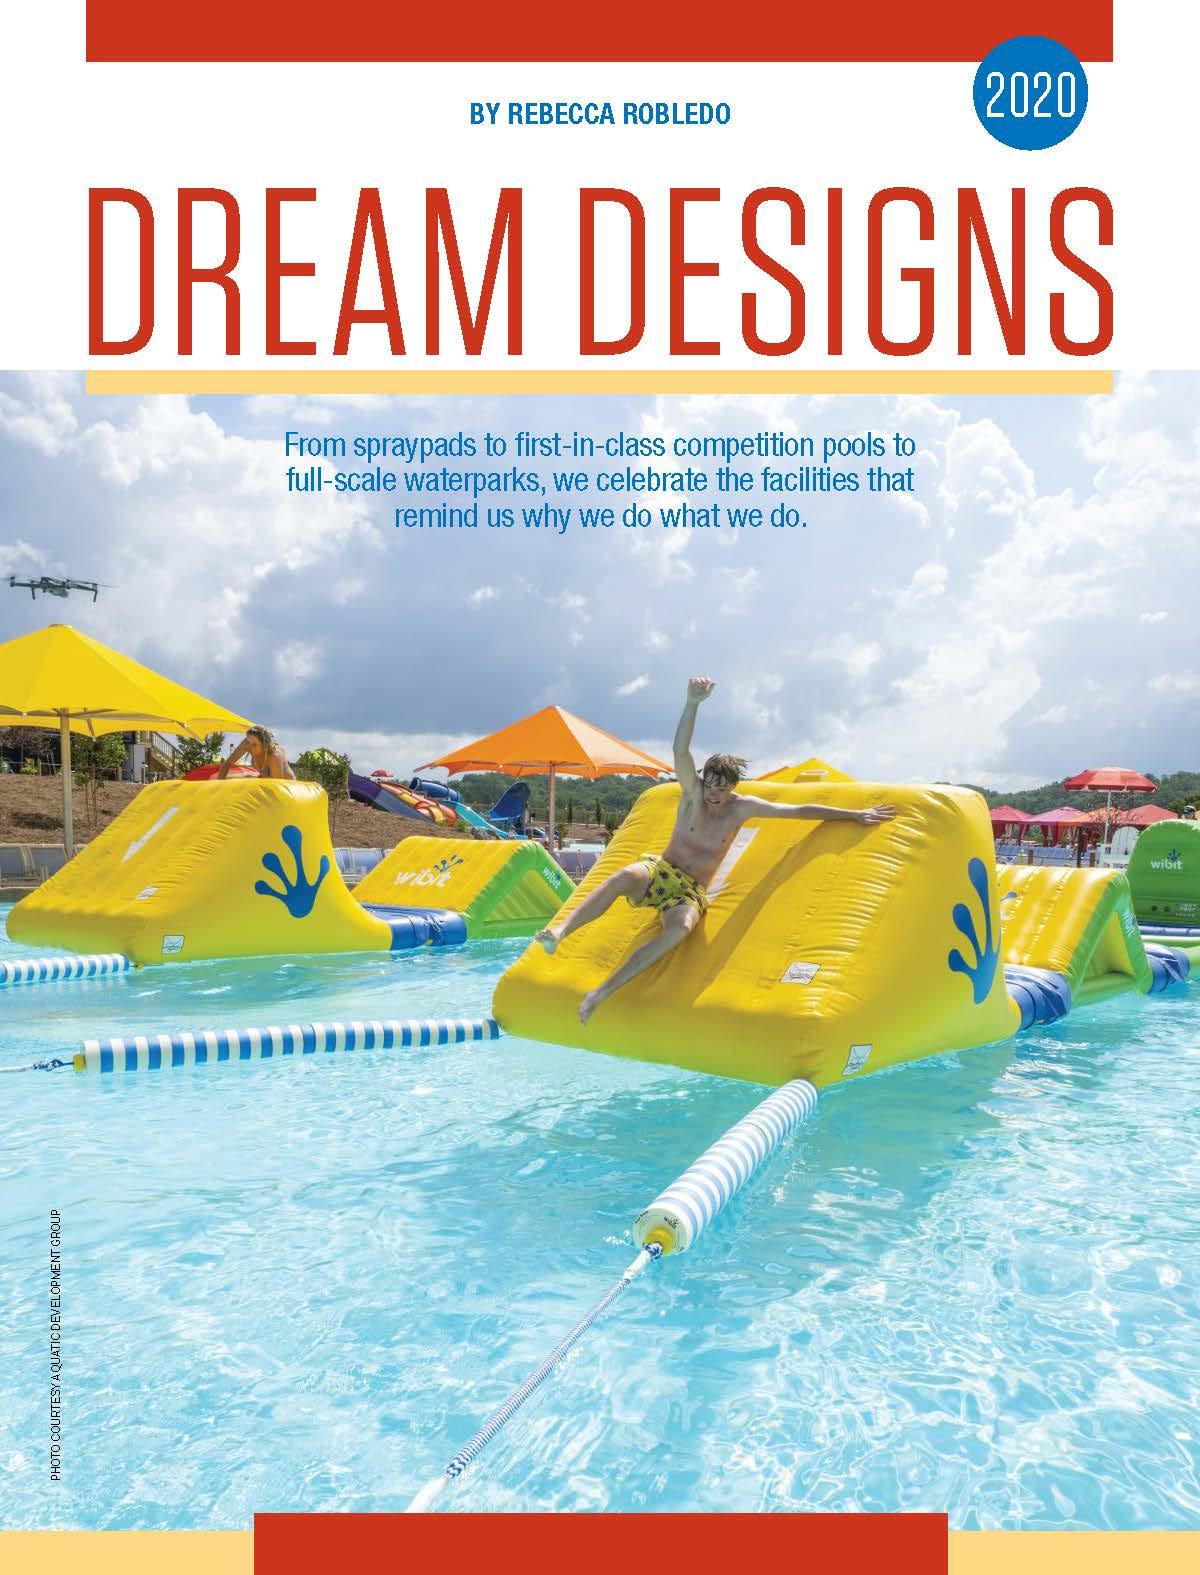 Aquatics international dream designs 2020 soaky mountain